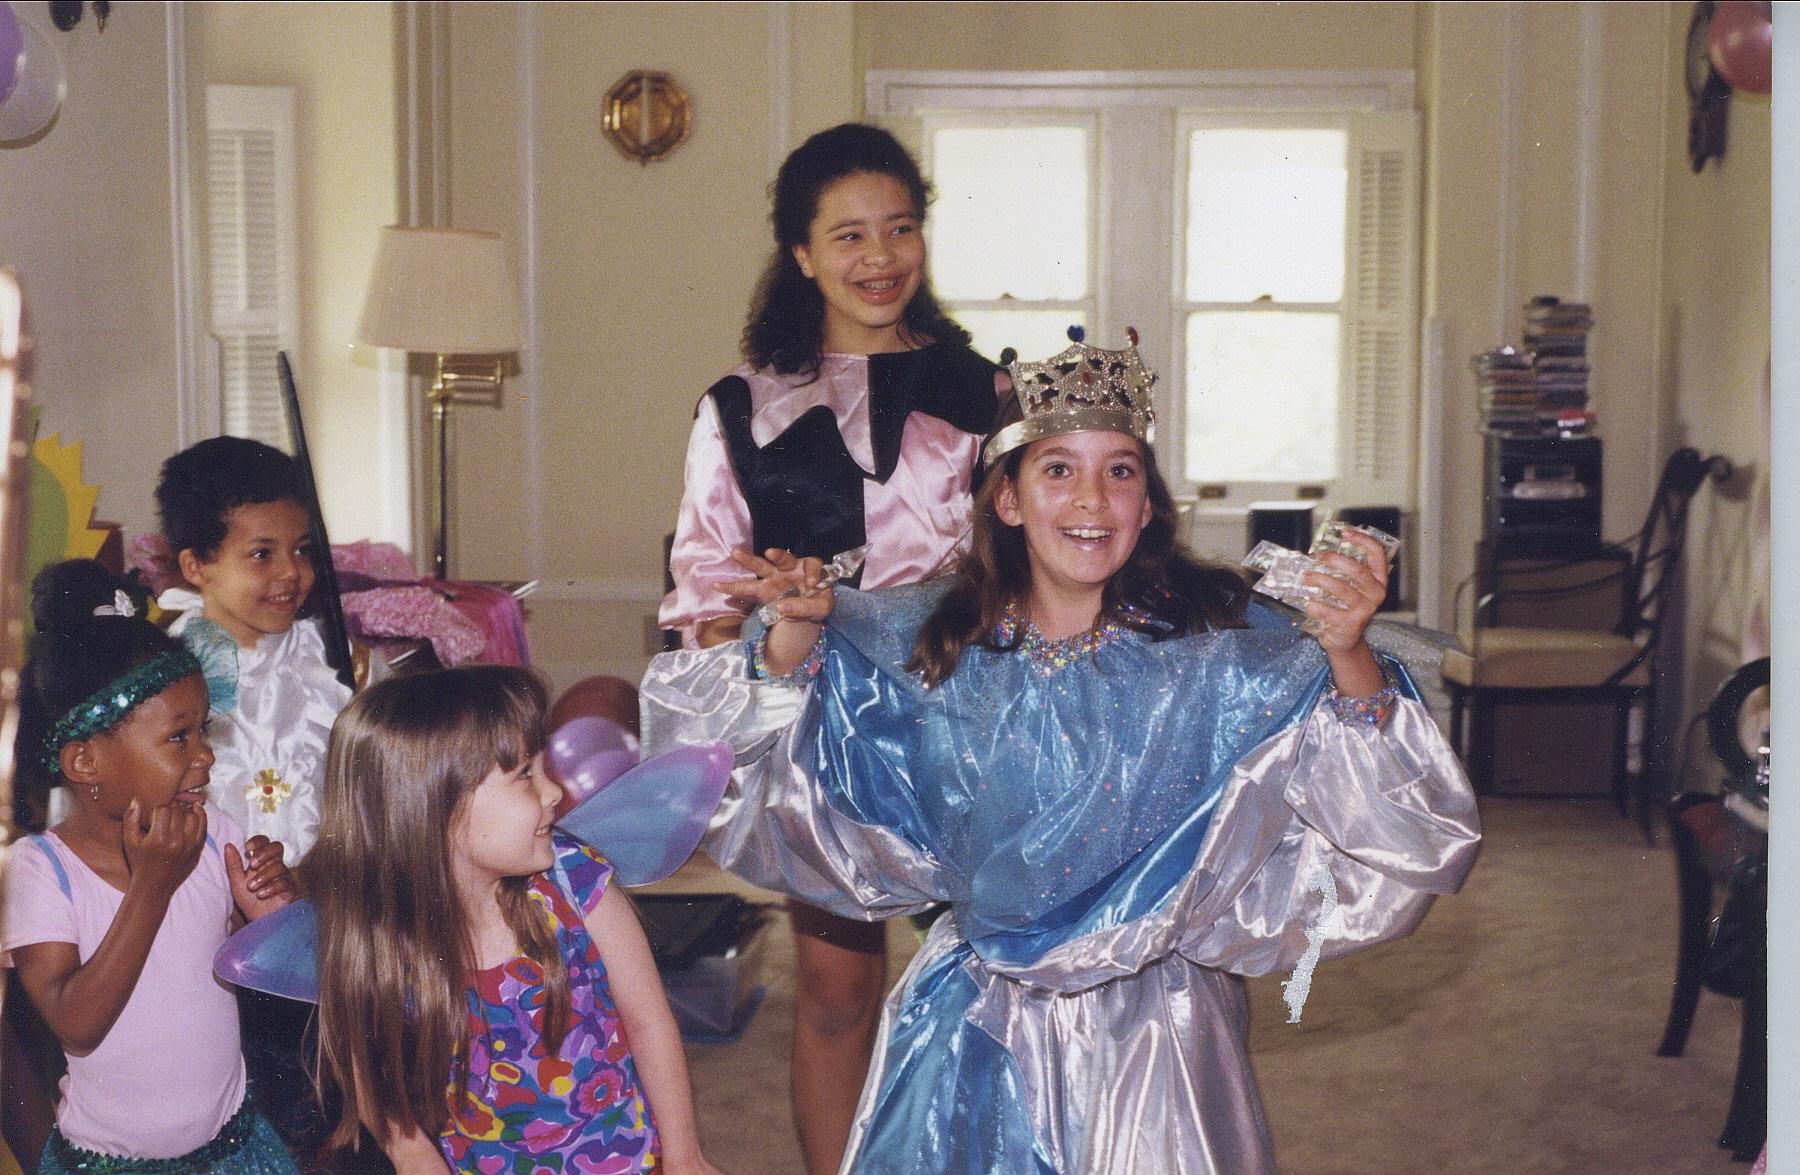 Savanah's Birthday Party 2000